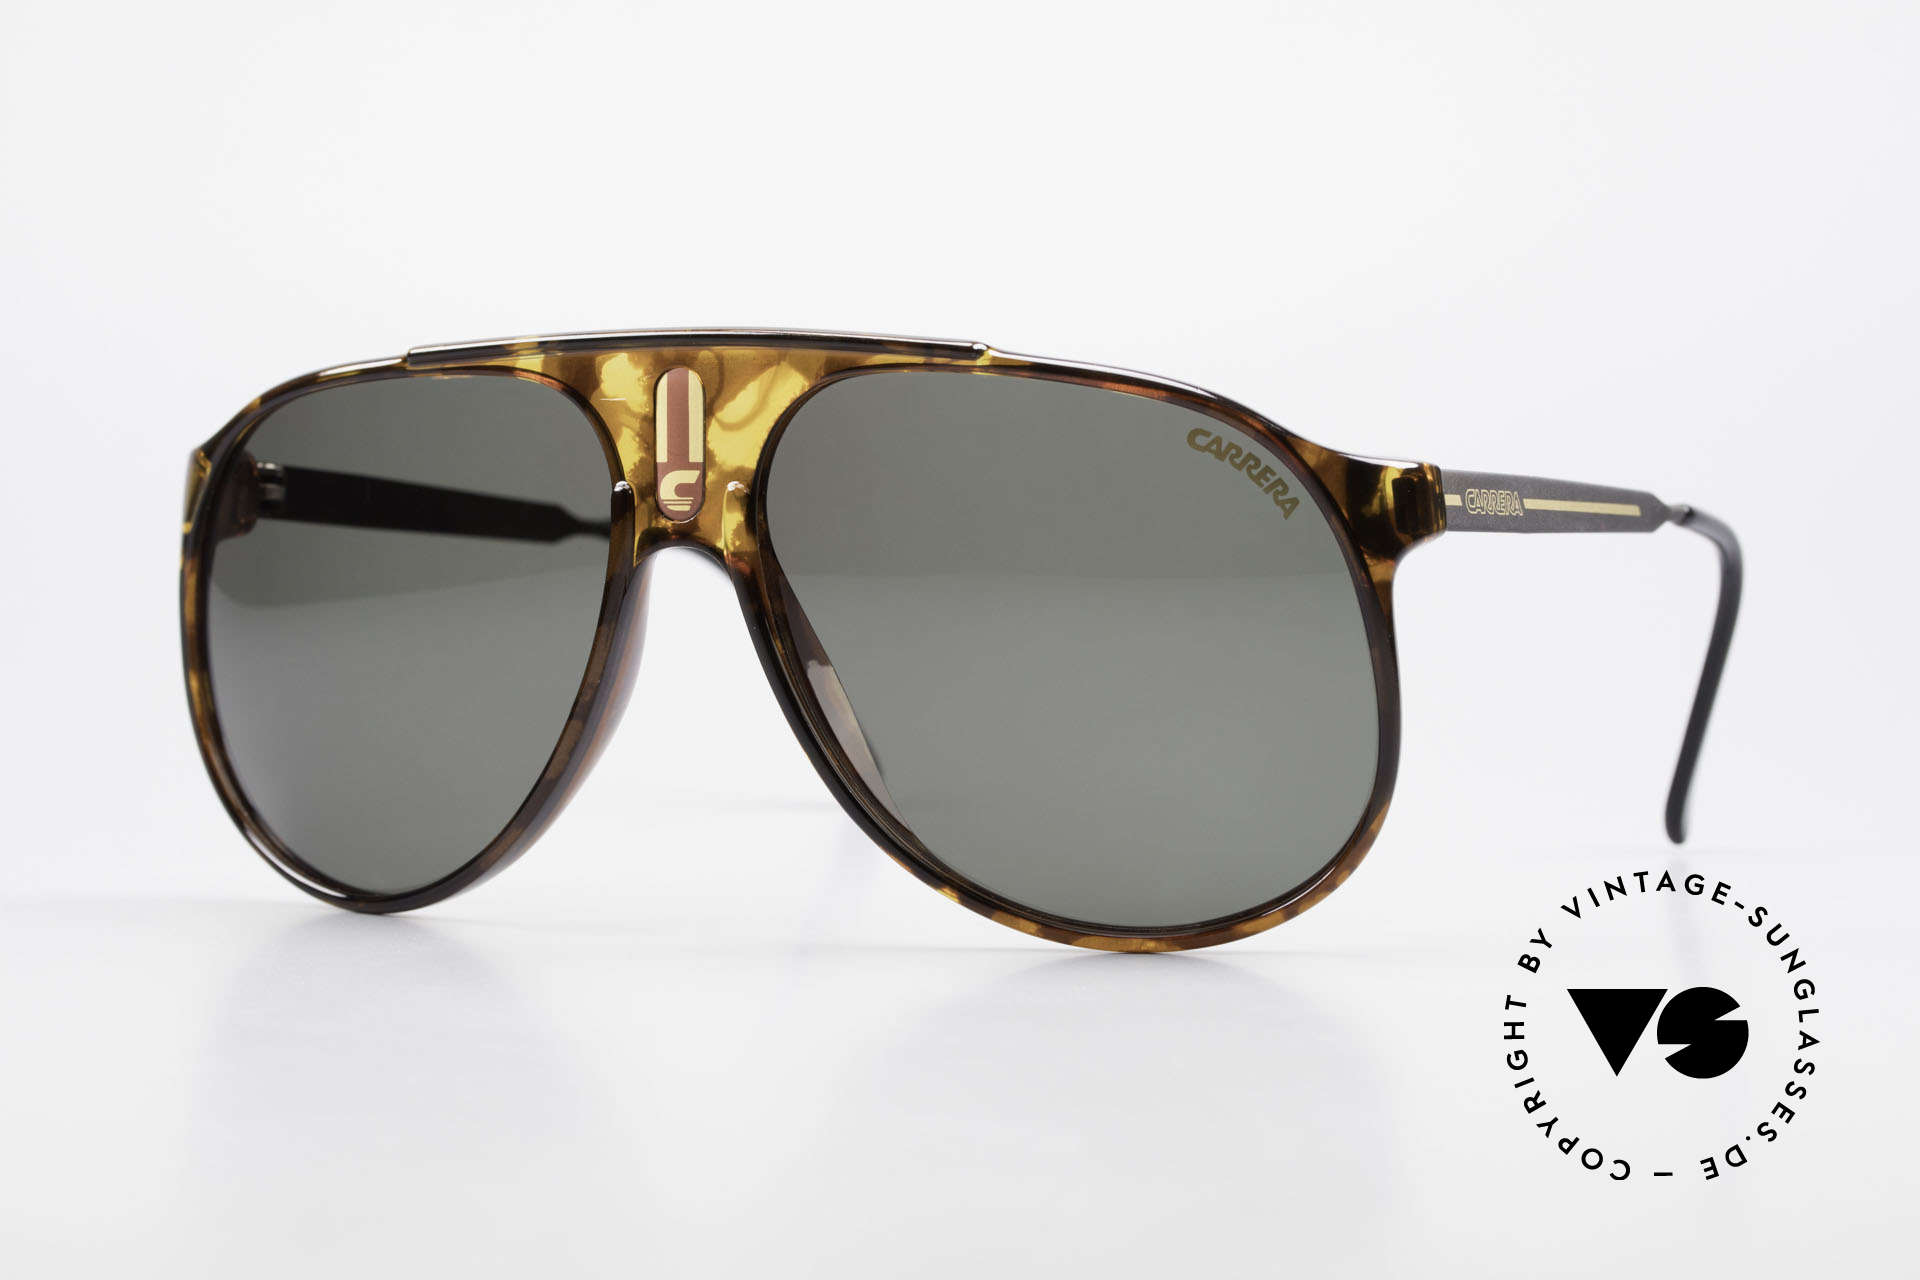 Carrera 5424 80's Aviator Sports Sunglasses, old 80's sports sunglasses by Carrera; true vintage, Made for Men